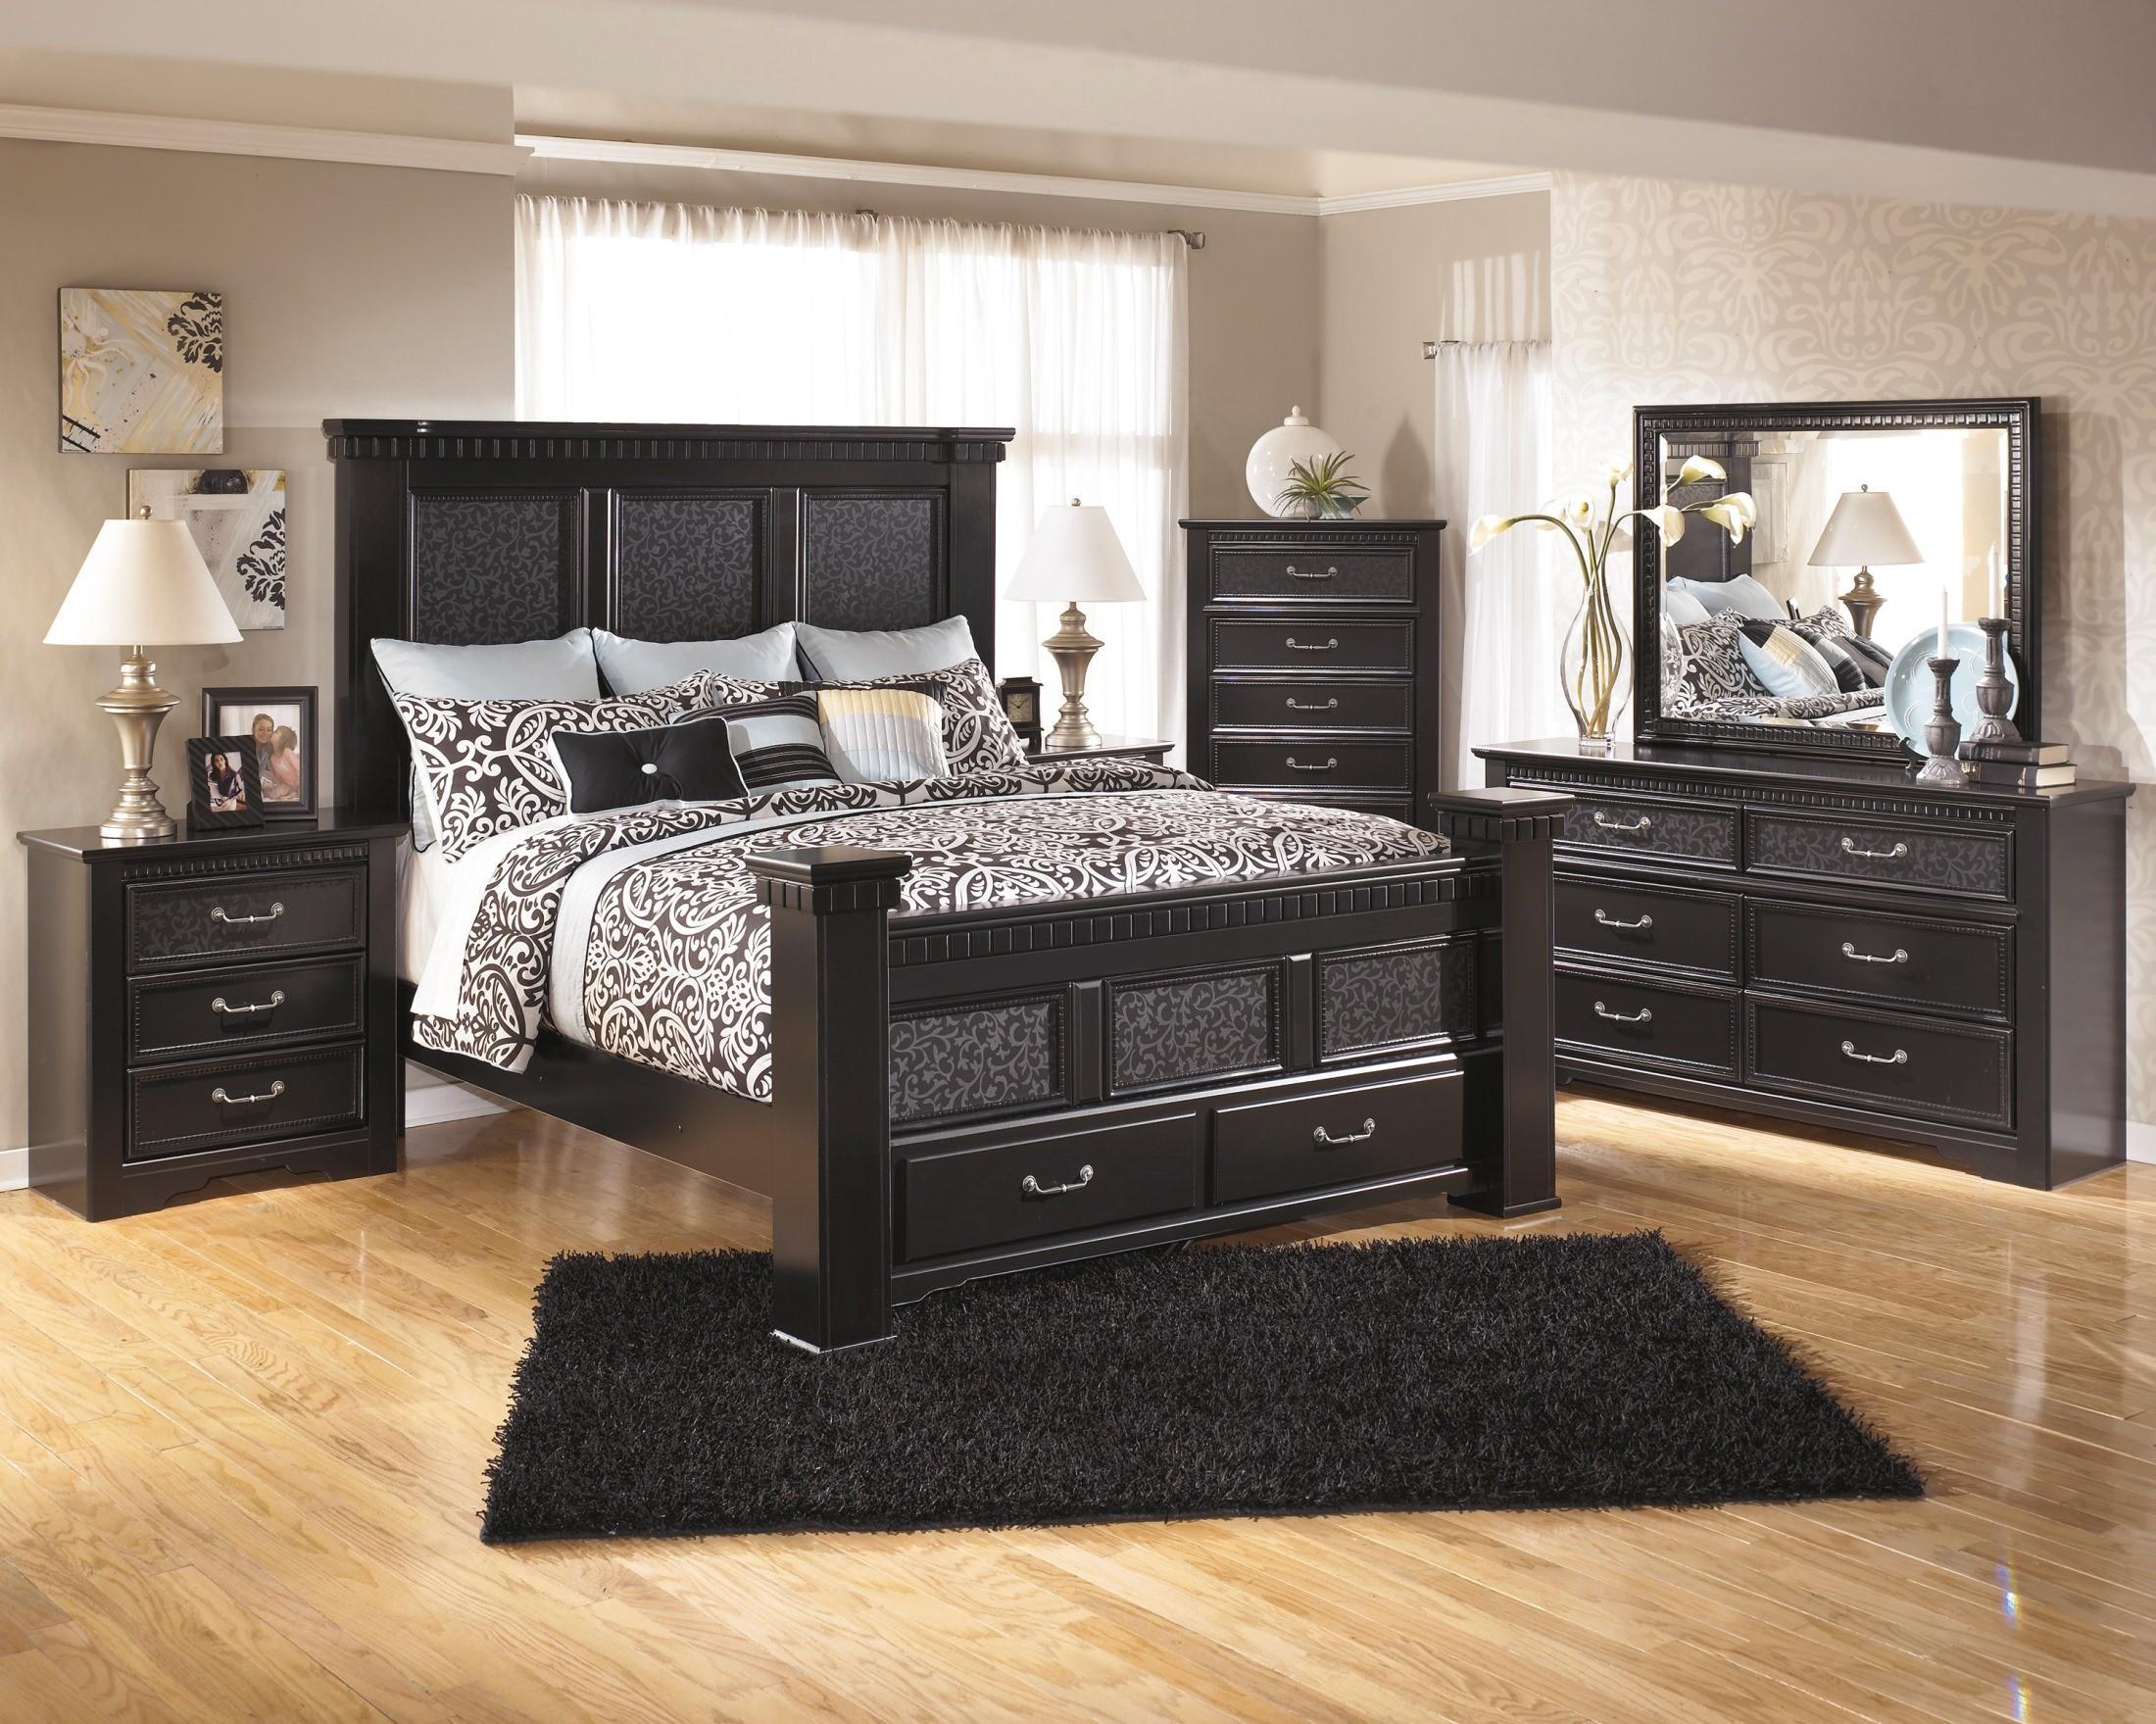 cavallino mansion storage bedroom set from ashley (b291)   coleman